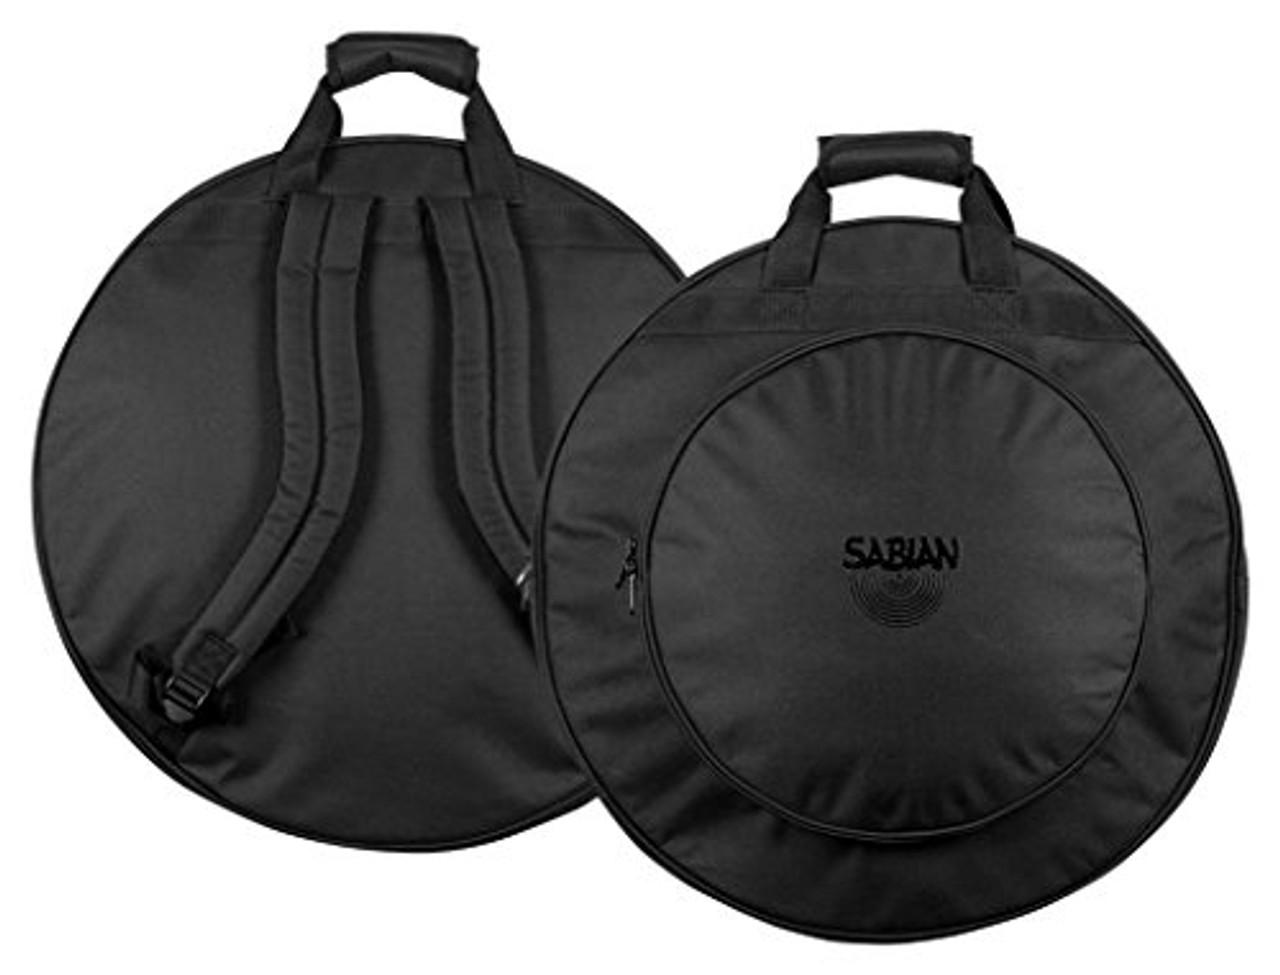 Sabian QUICK 22 CYMBAL BAG (Black)